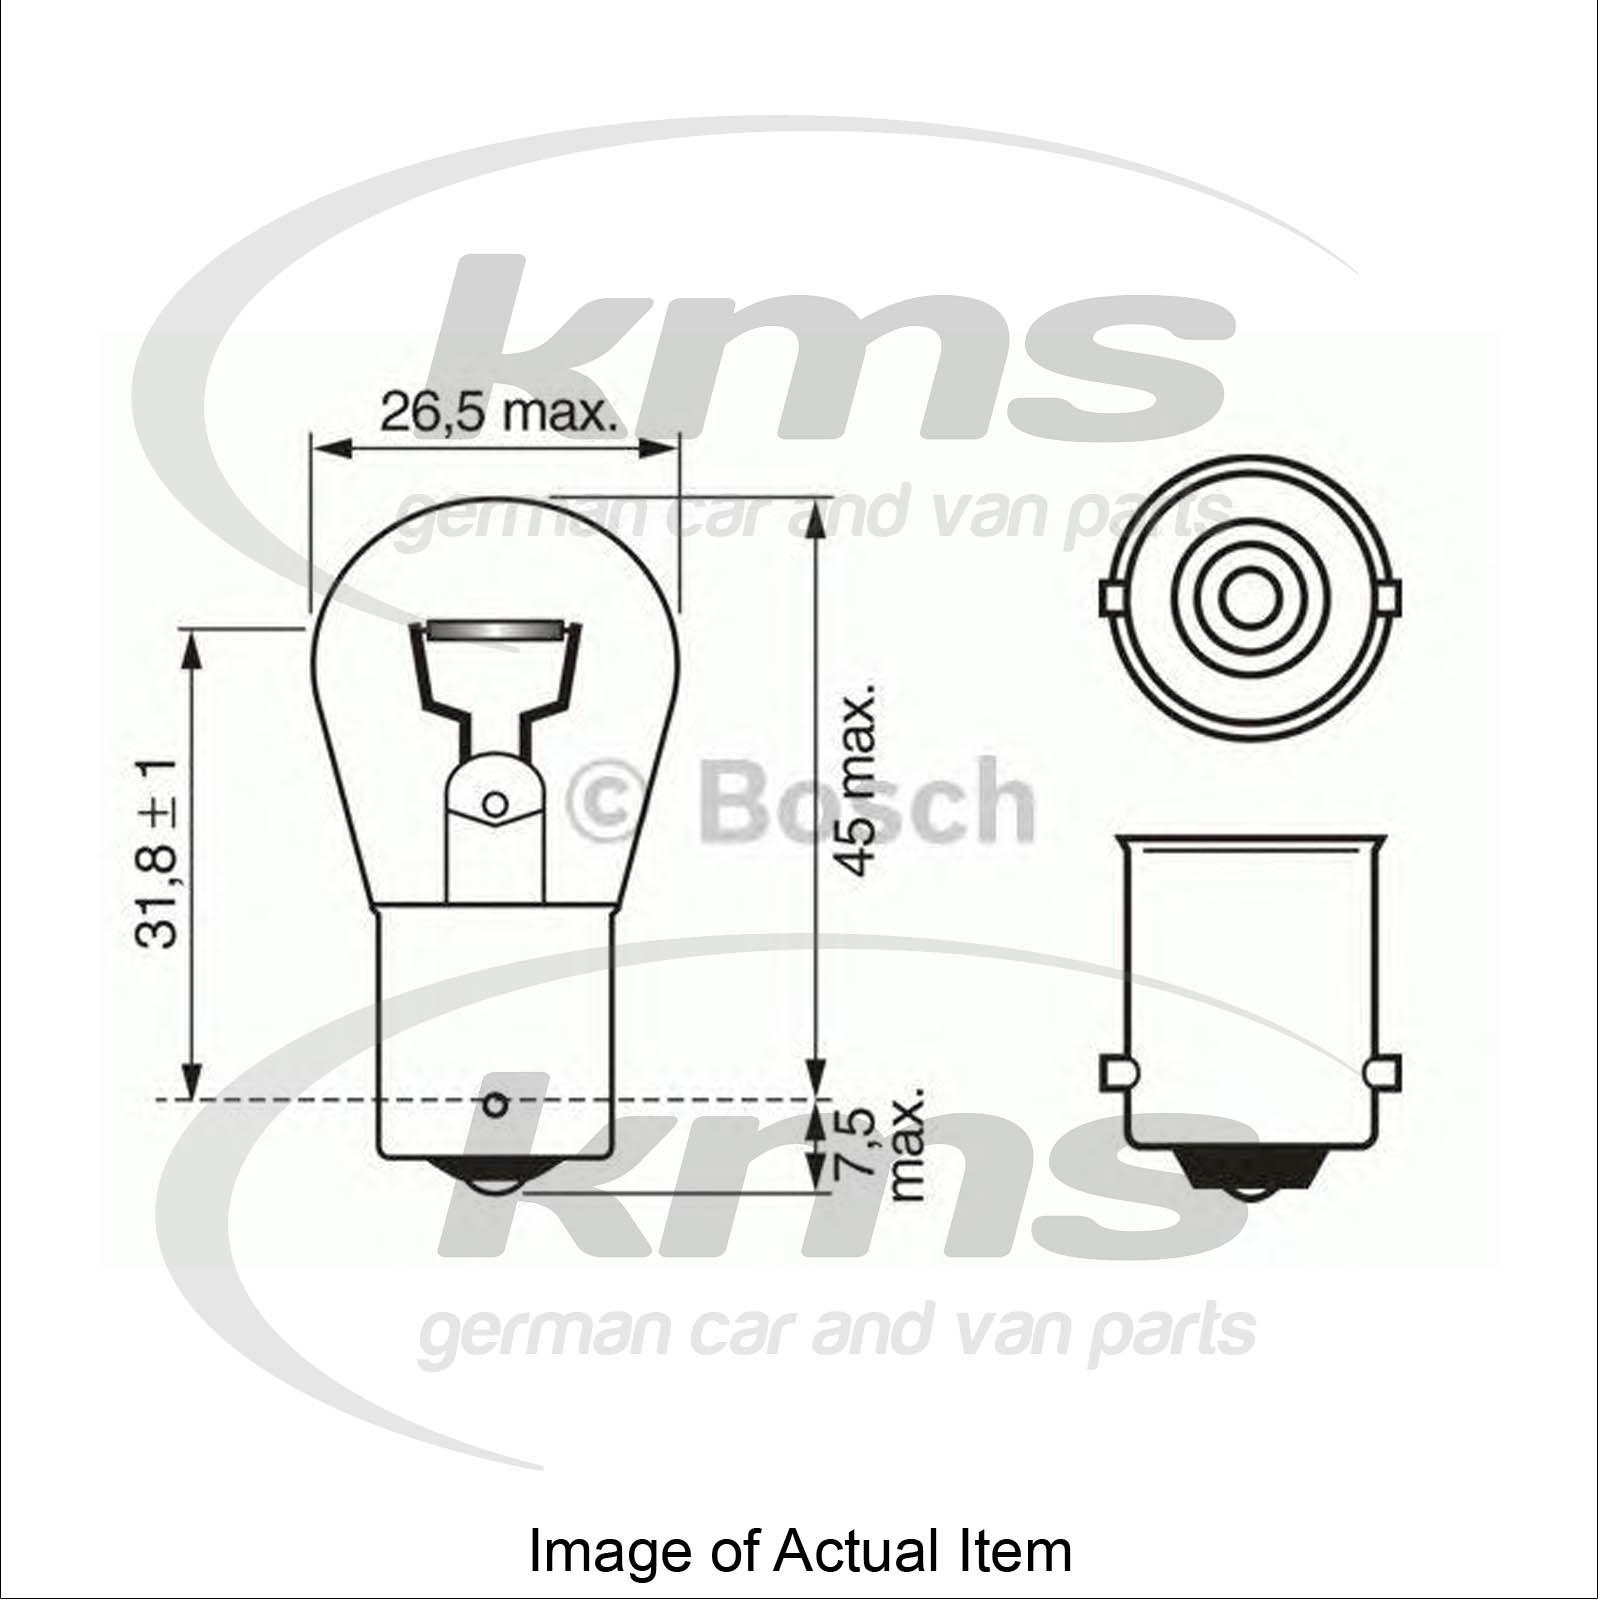 Bulb For rear fog light BMW 3 Touring (E30) 316 i Estate